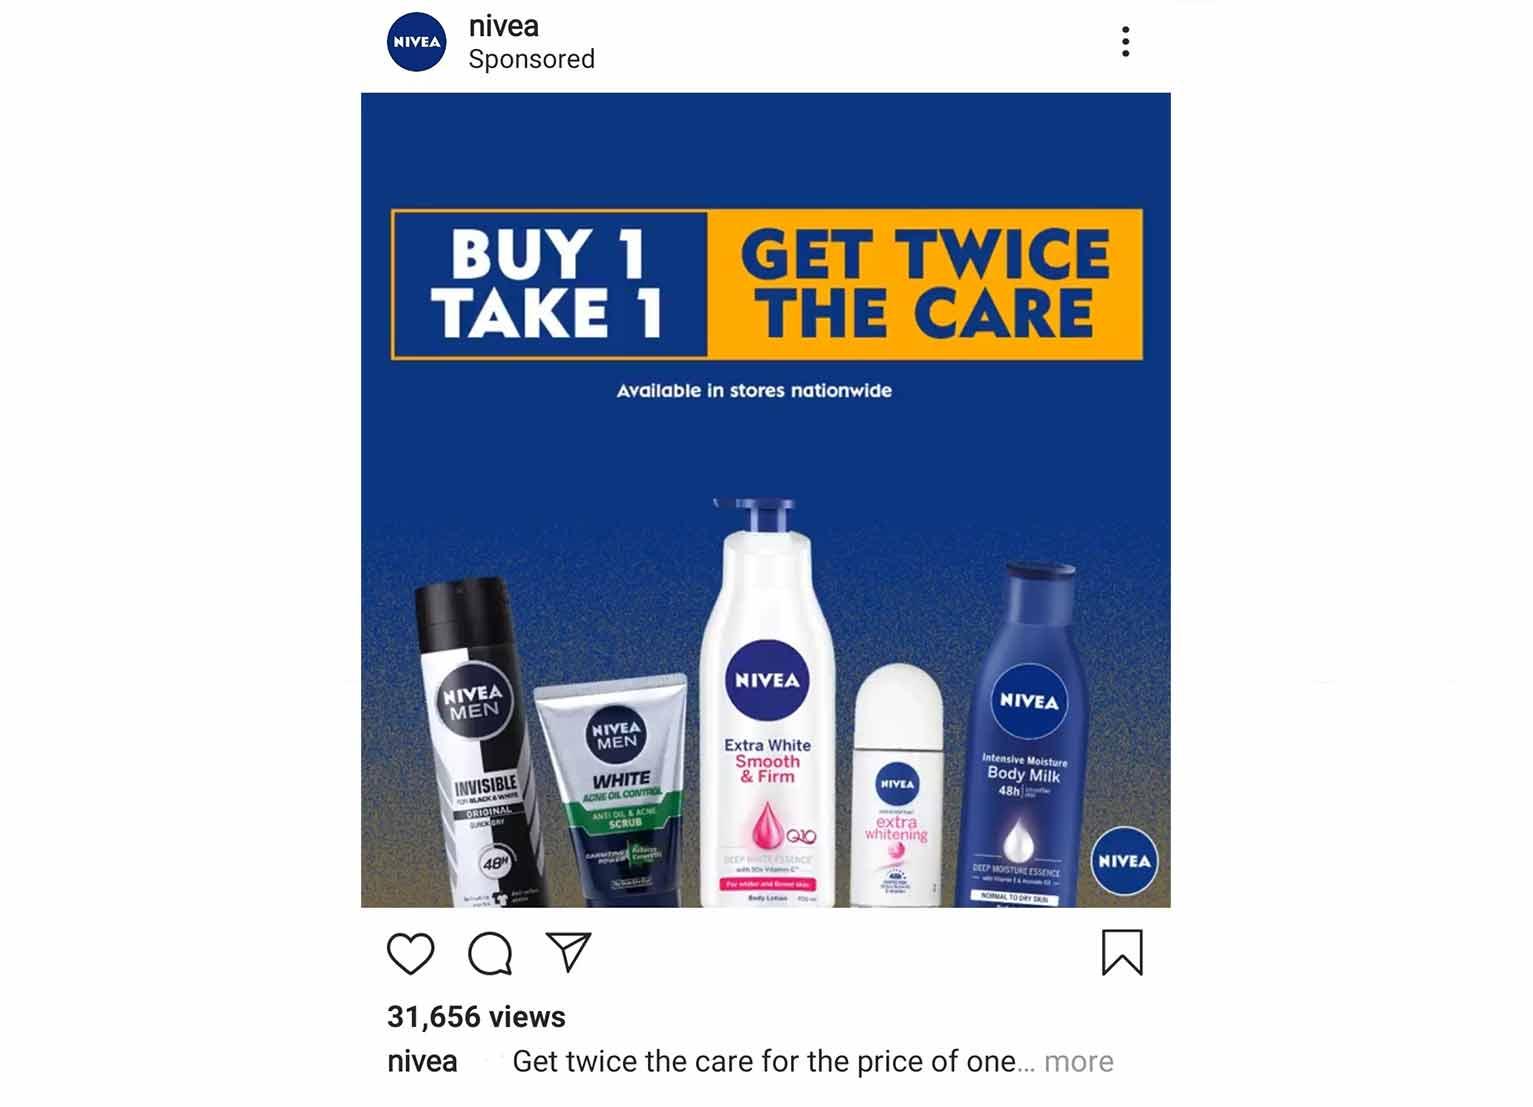 Nivea's social-media ad features their 1-for-1 deals.